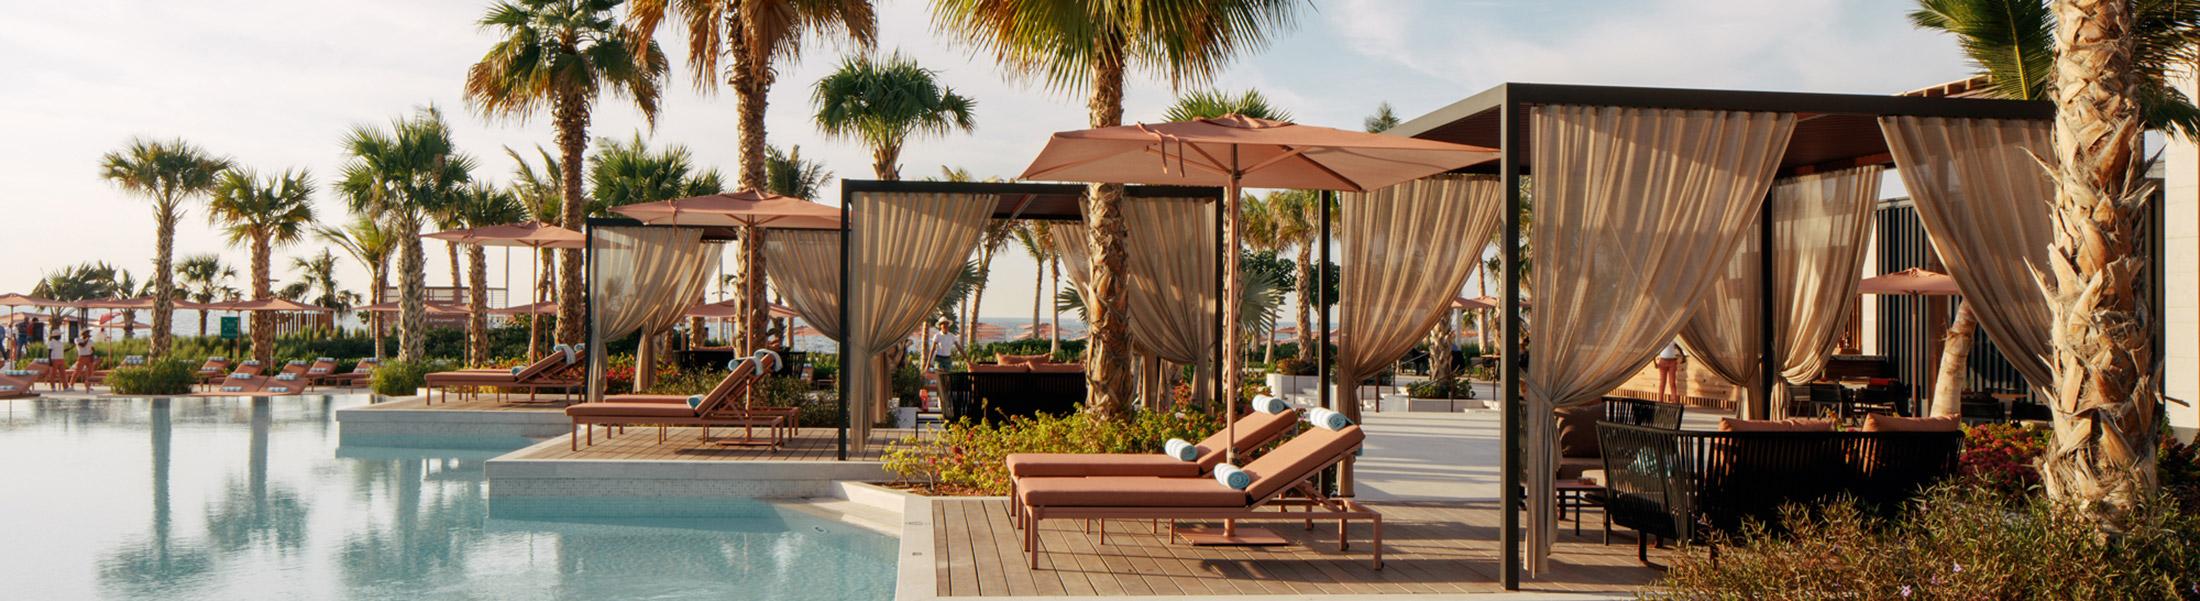 Pool cabanas at Caesars Palace Bluewaters